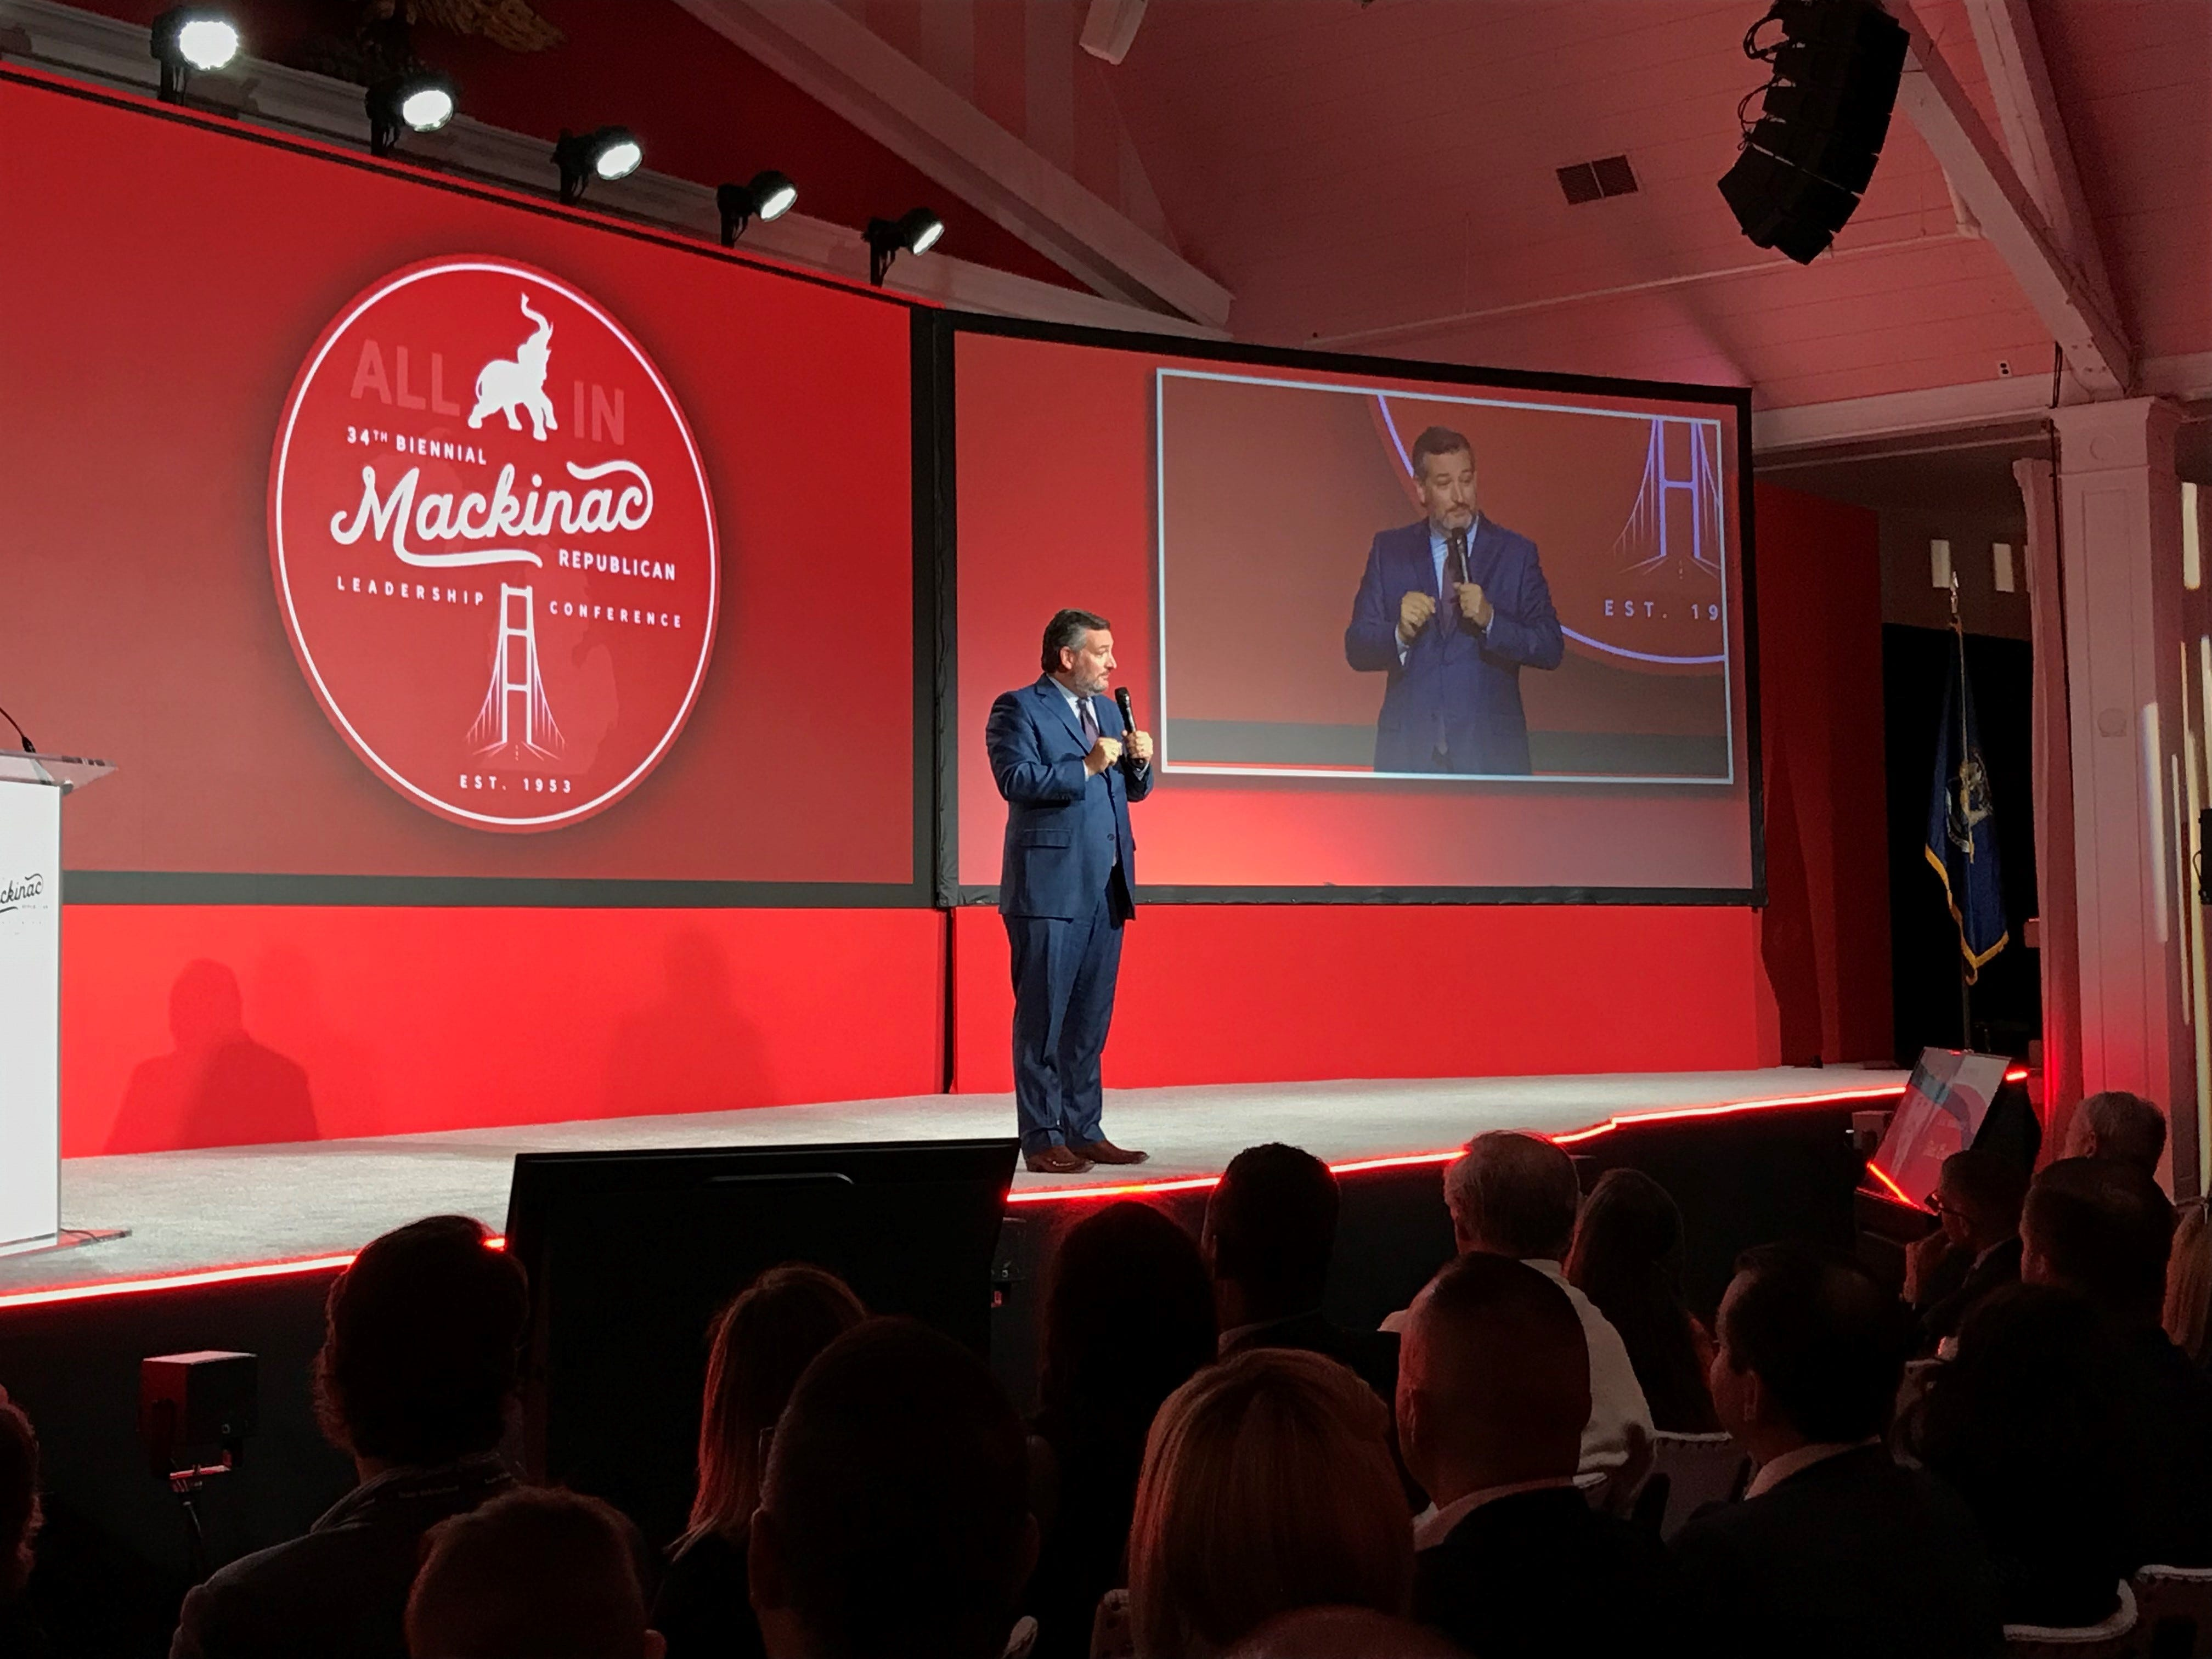 Cruz, McDaniel slam Whitmer during opening speeches at Mackinac GOP conference